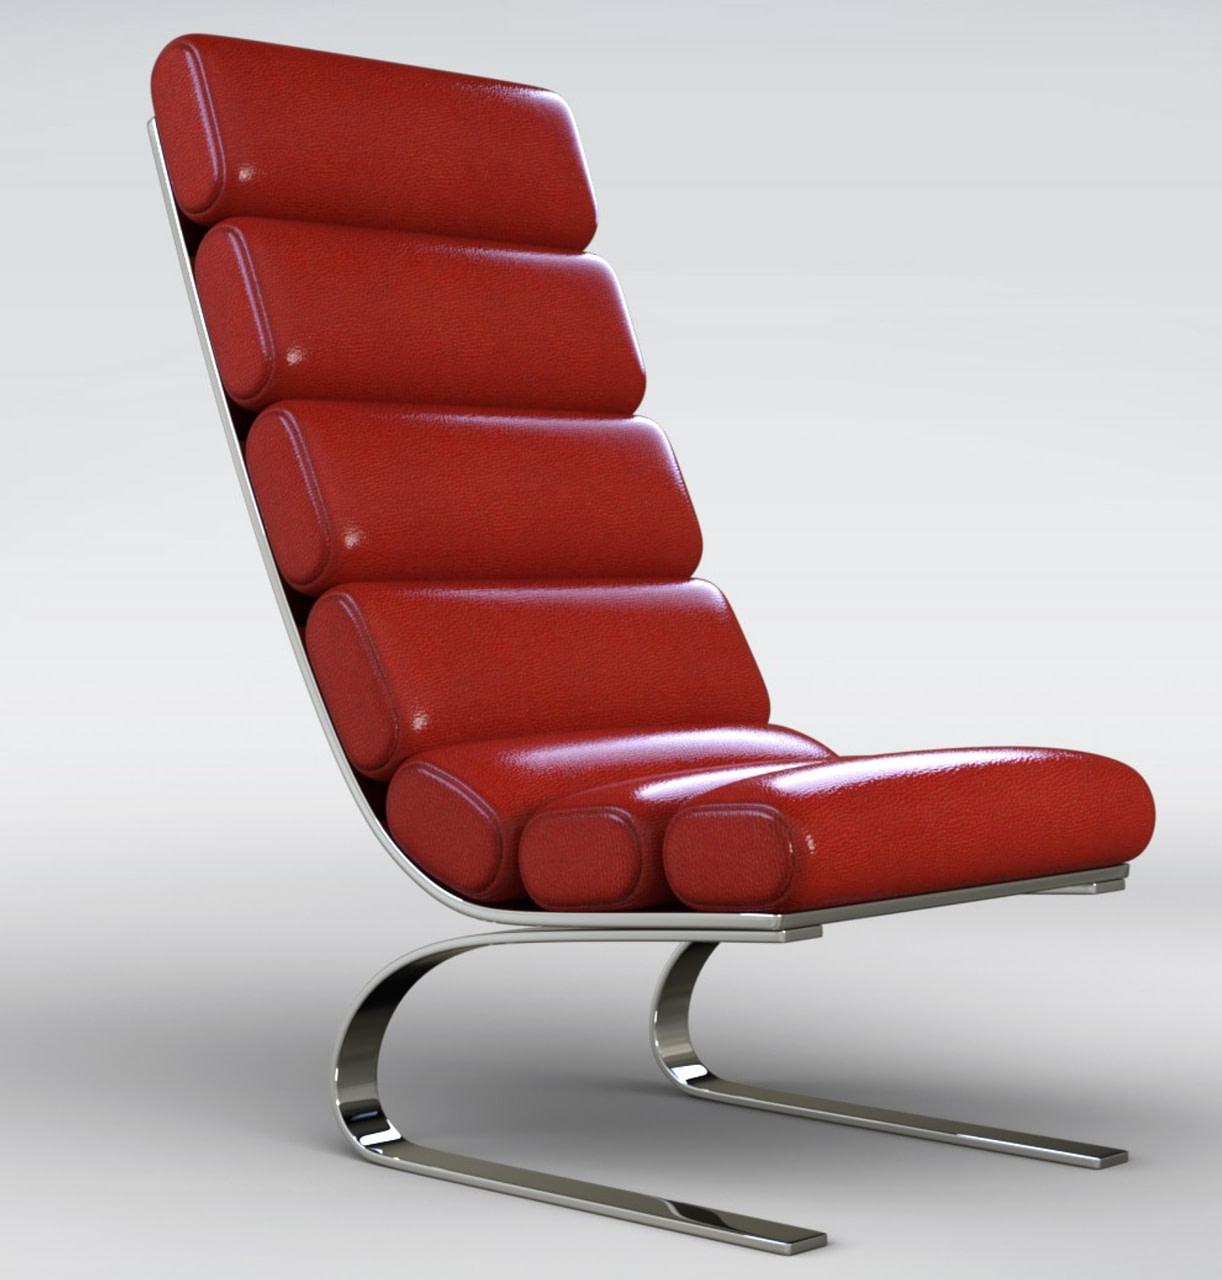 luxury morphing 3d chair model